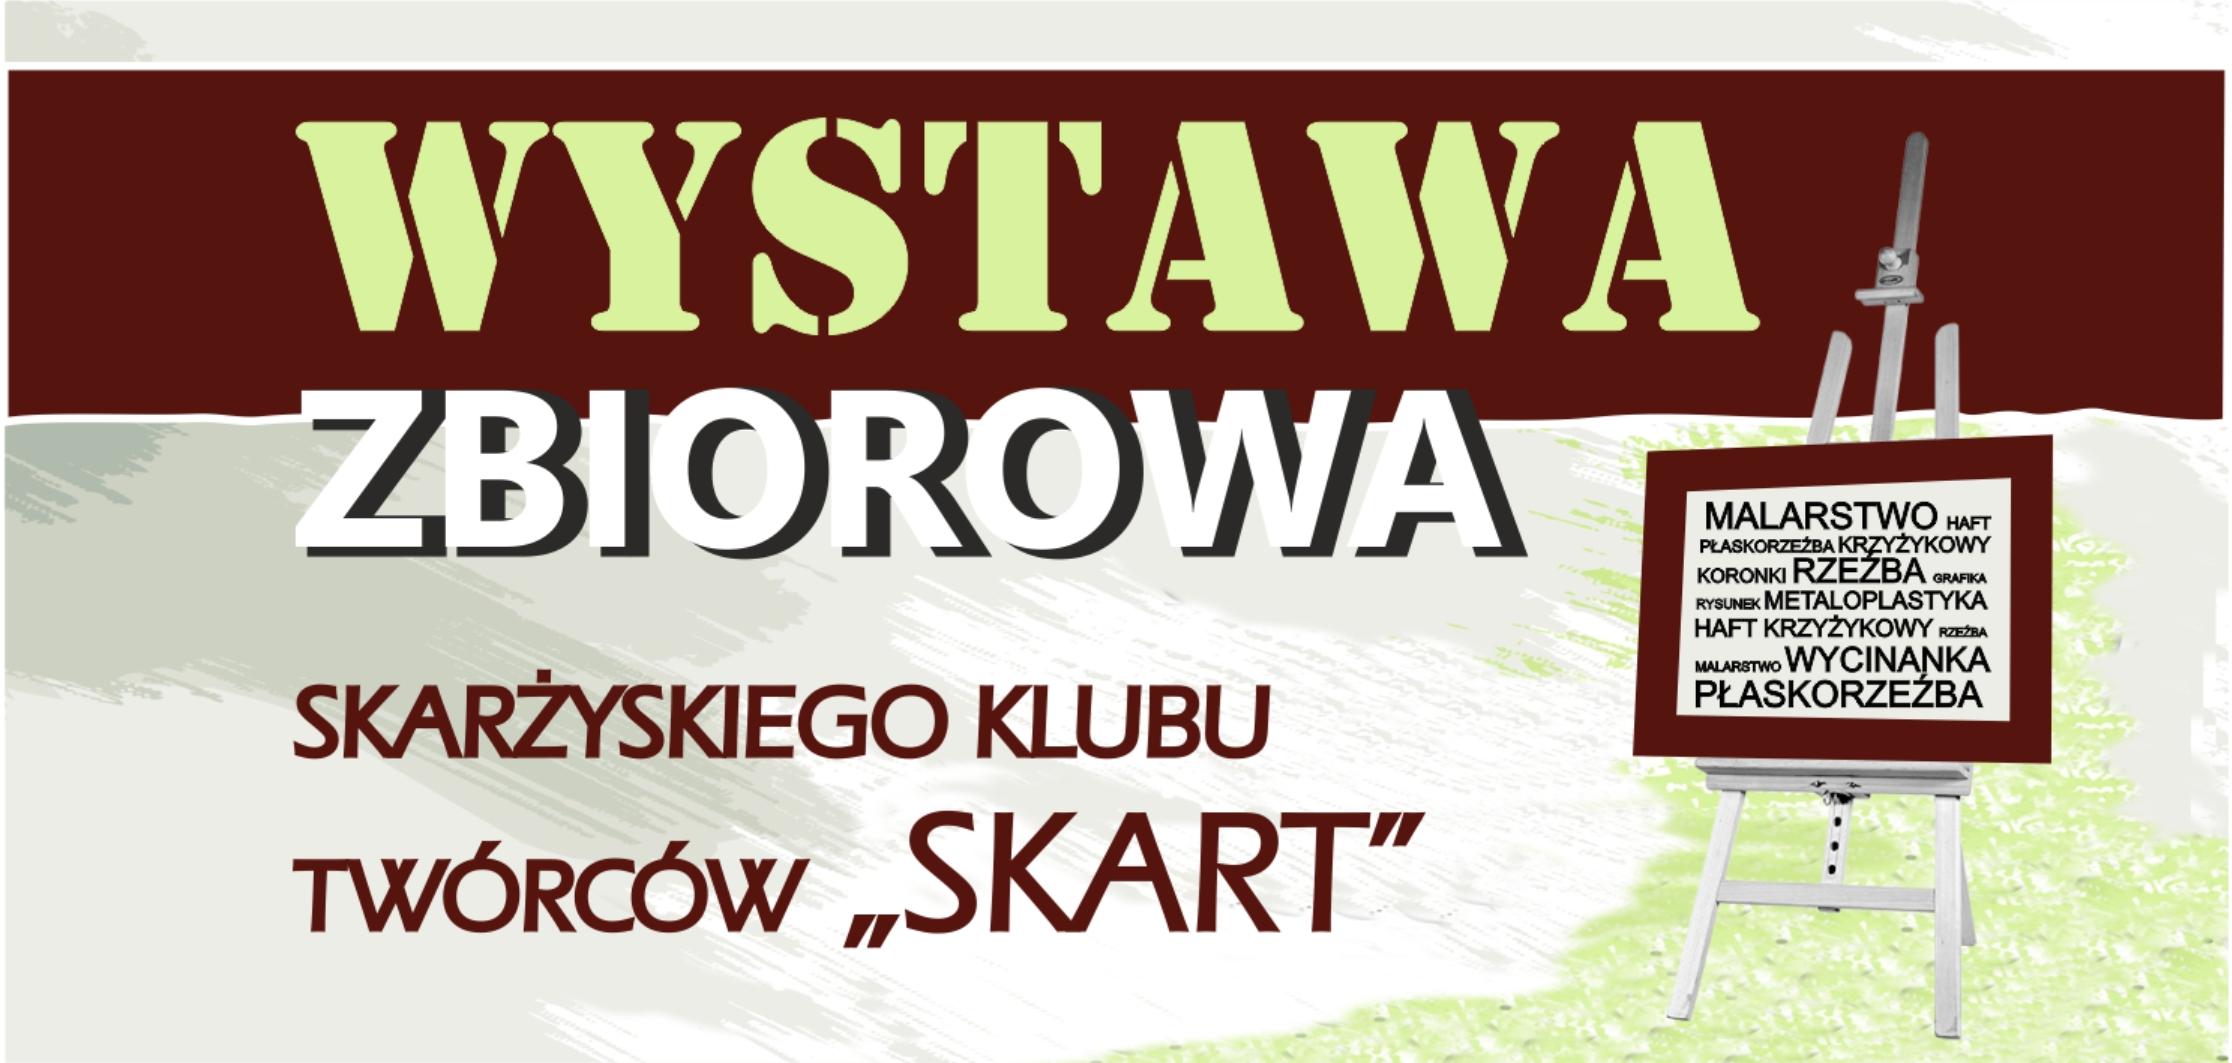 wystawa_zbiorowa_SKARTU_2018_cover